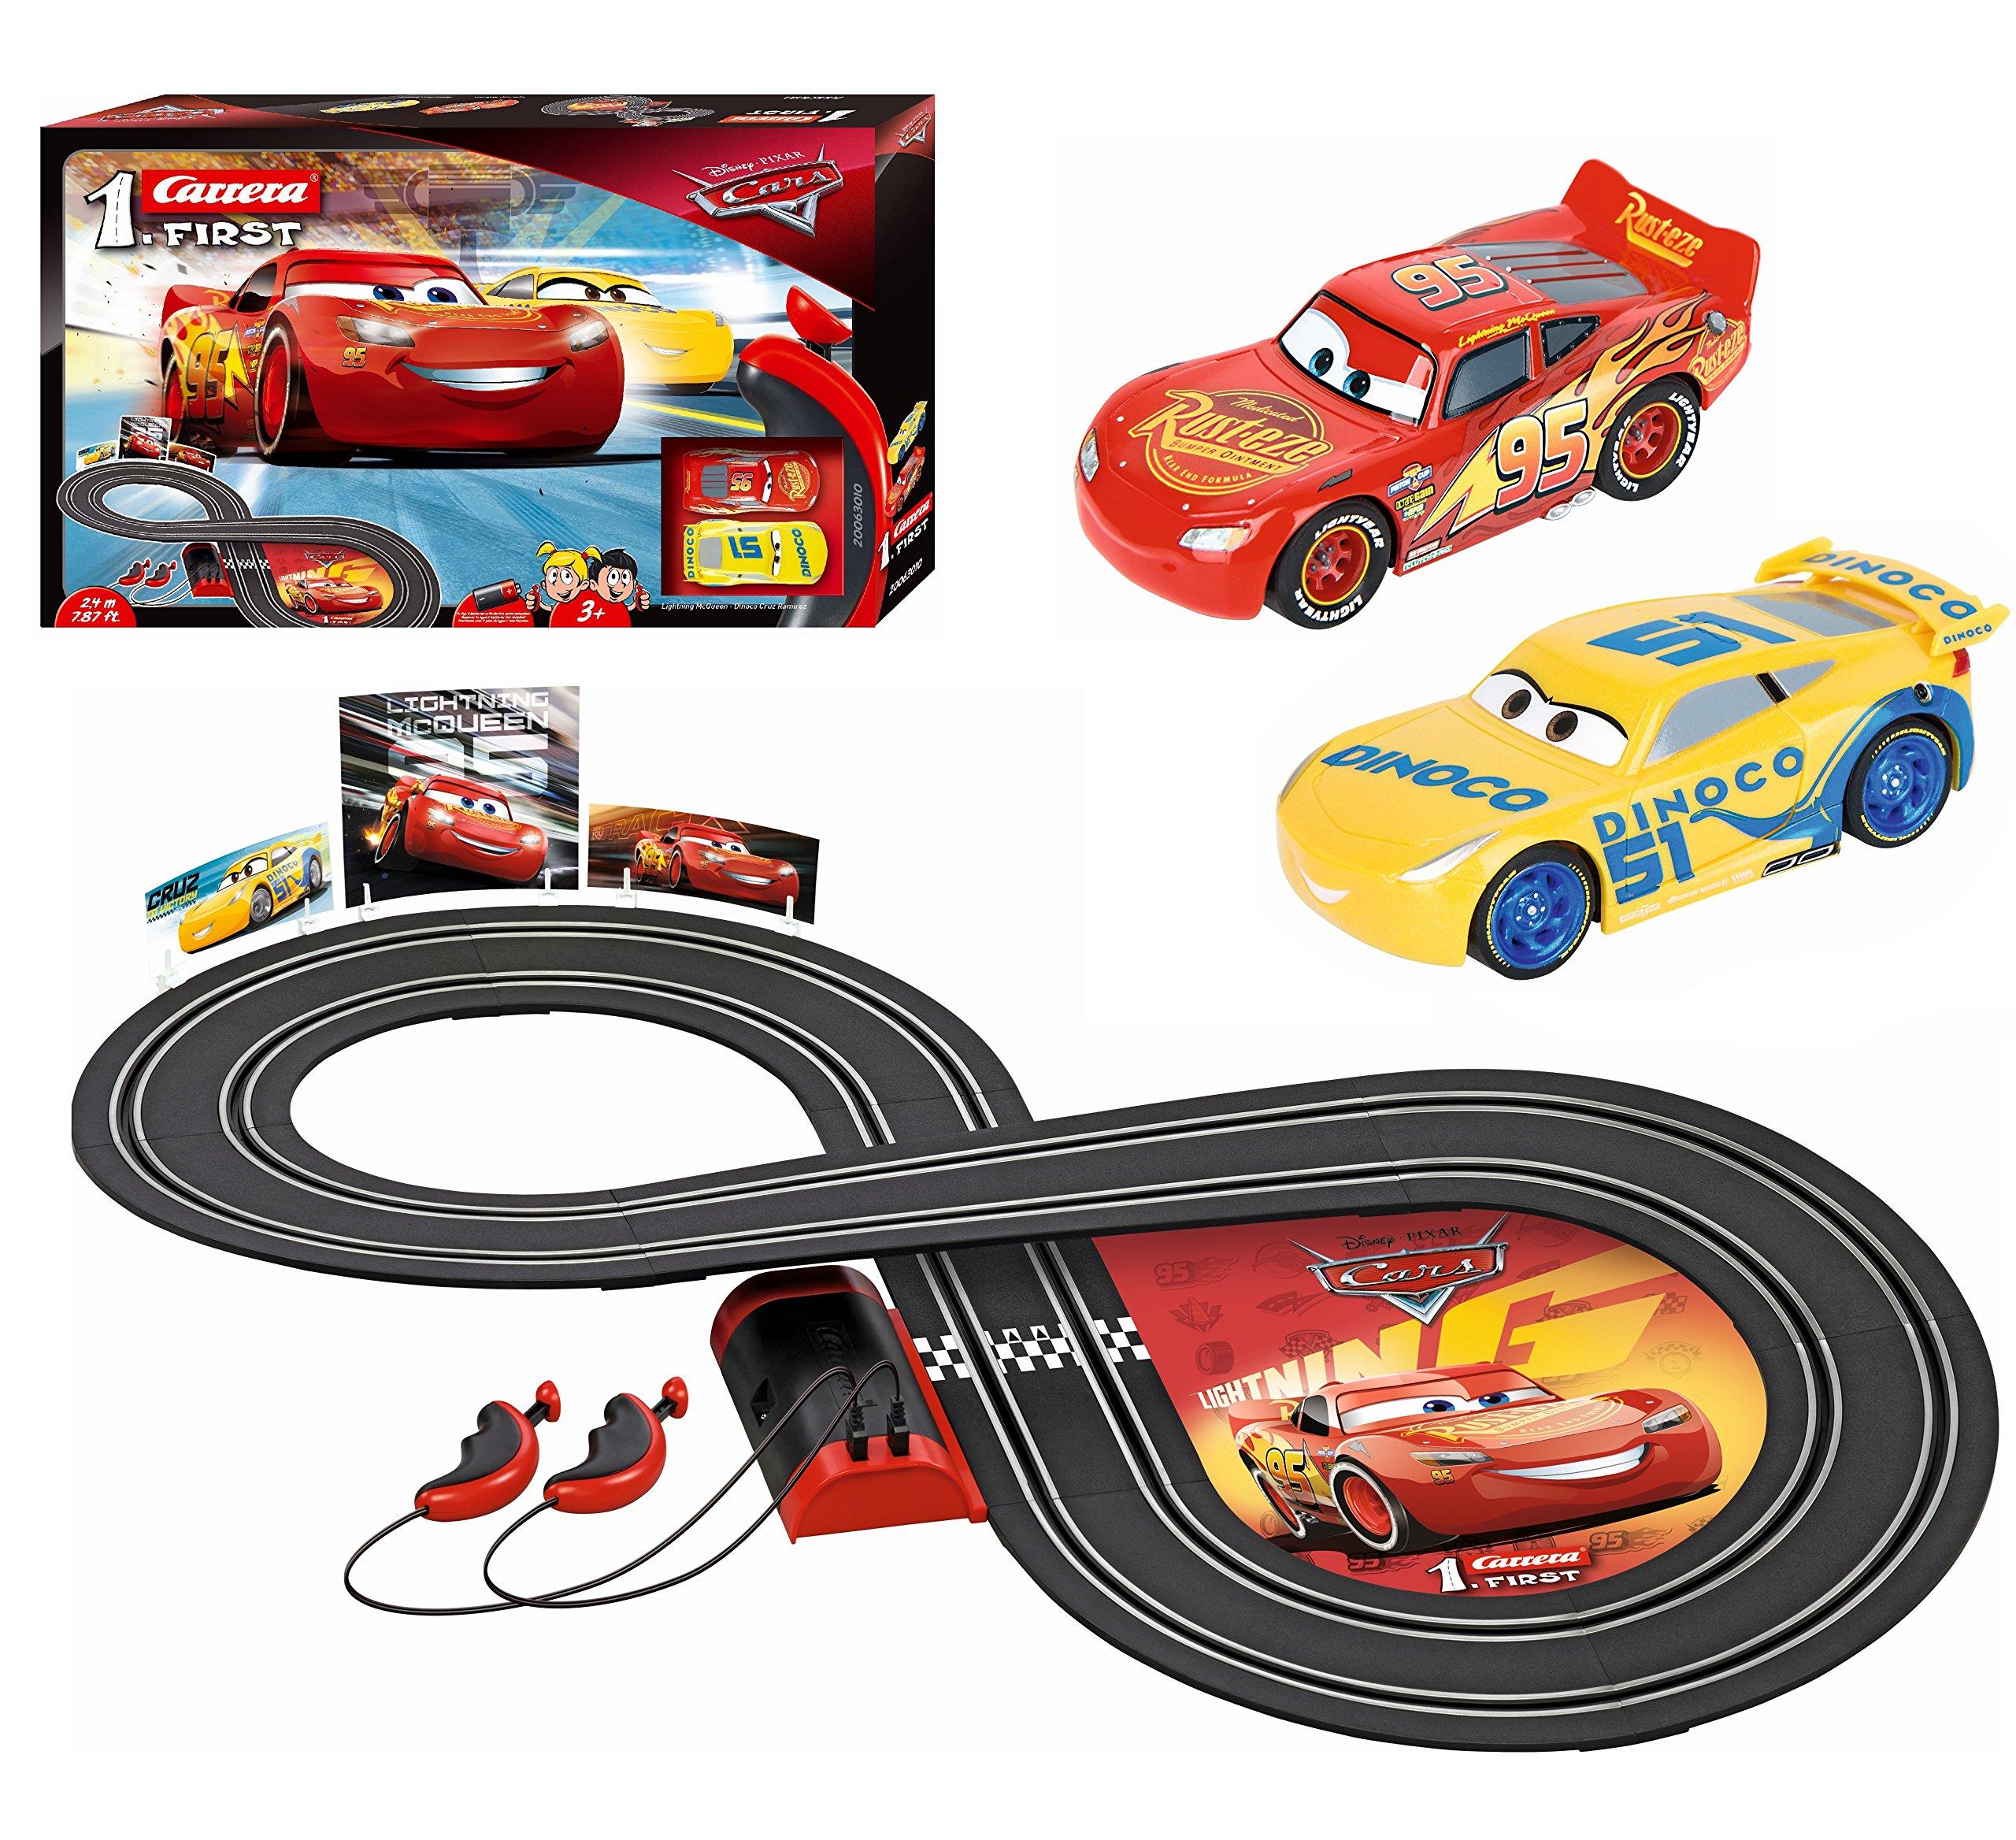 Disney Cars 3 Carrera First Race Track Set – Lightning ...